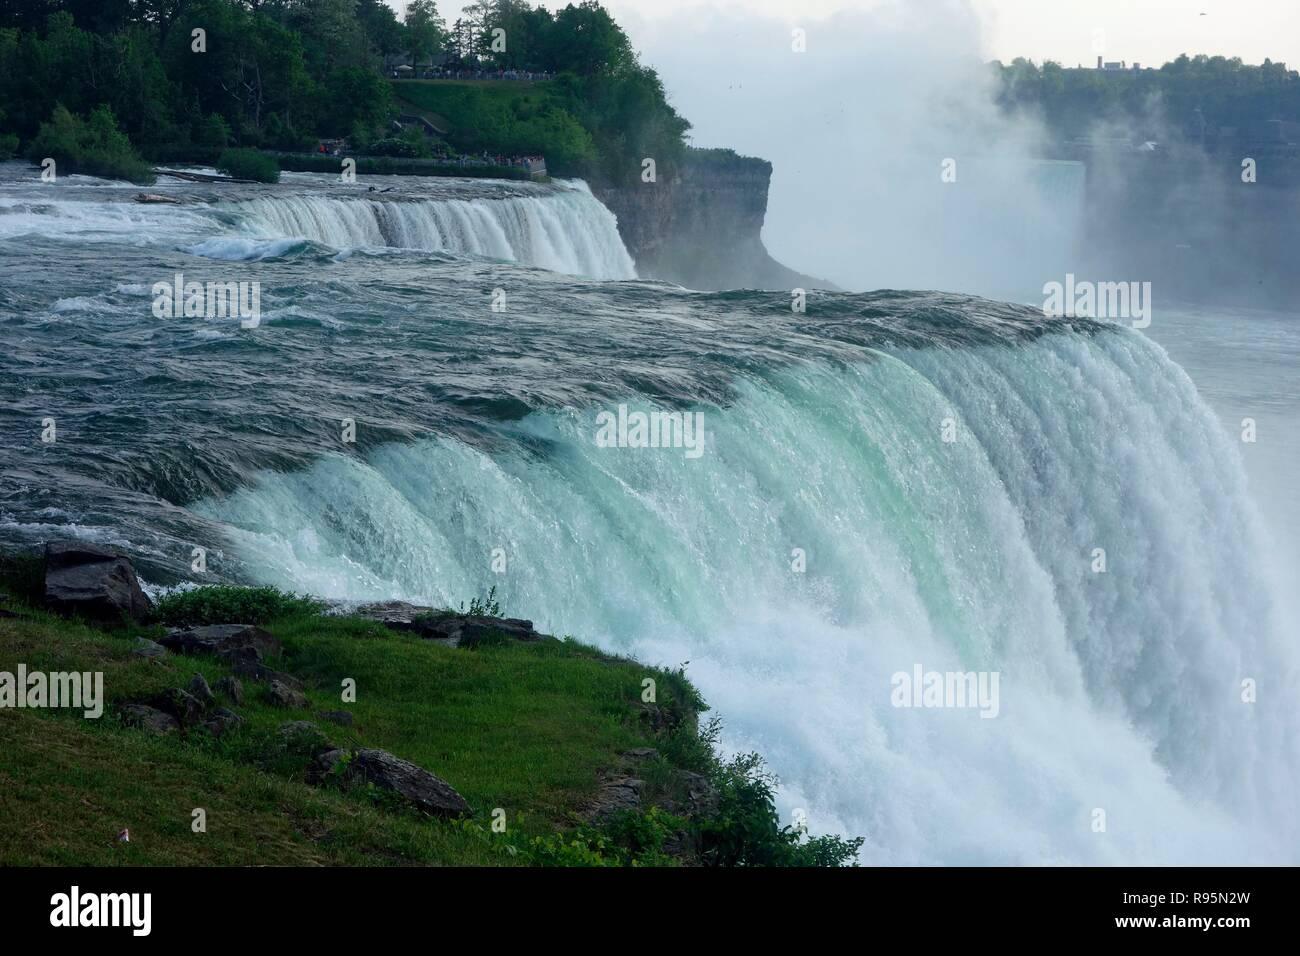 Niagara Falls From The American Side Niagara Falls New